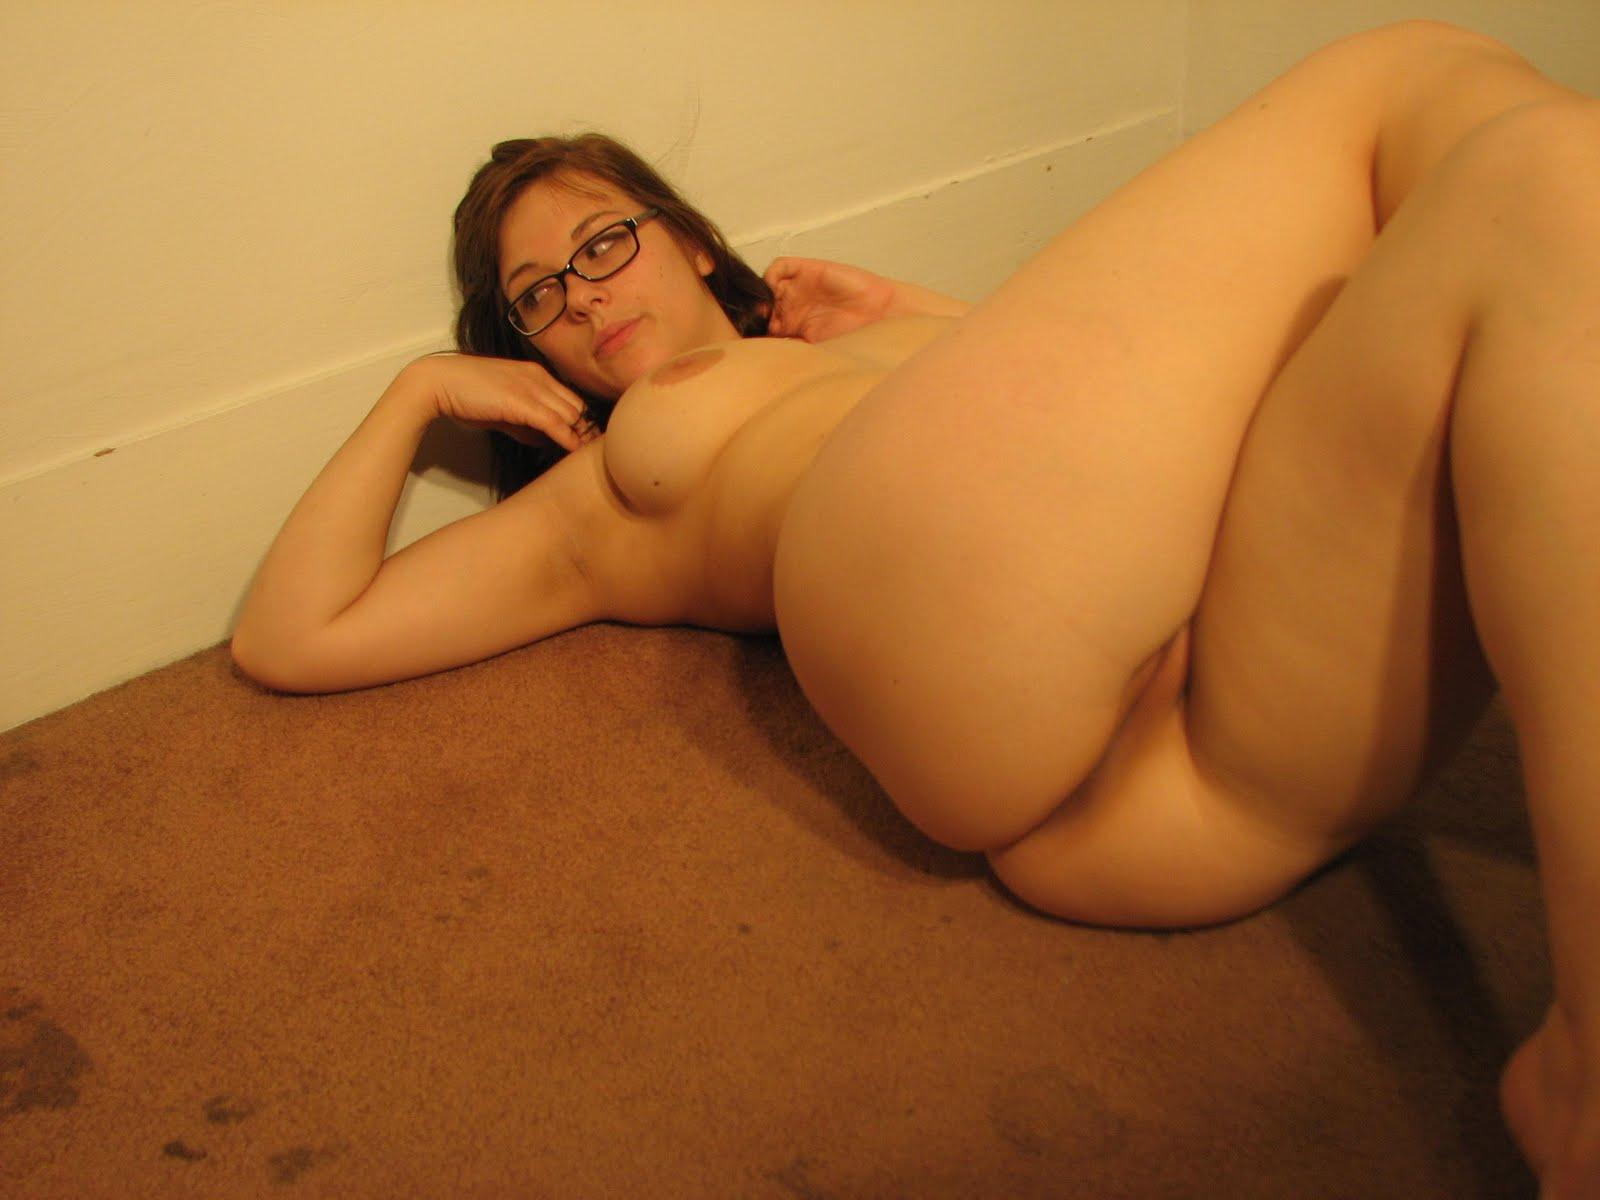 Naked Village - Sexy Mandy | hot milf american